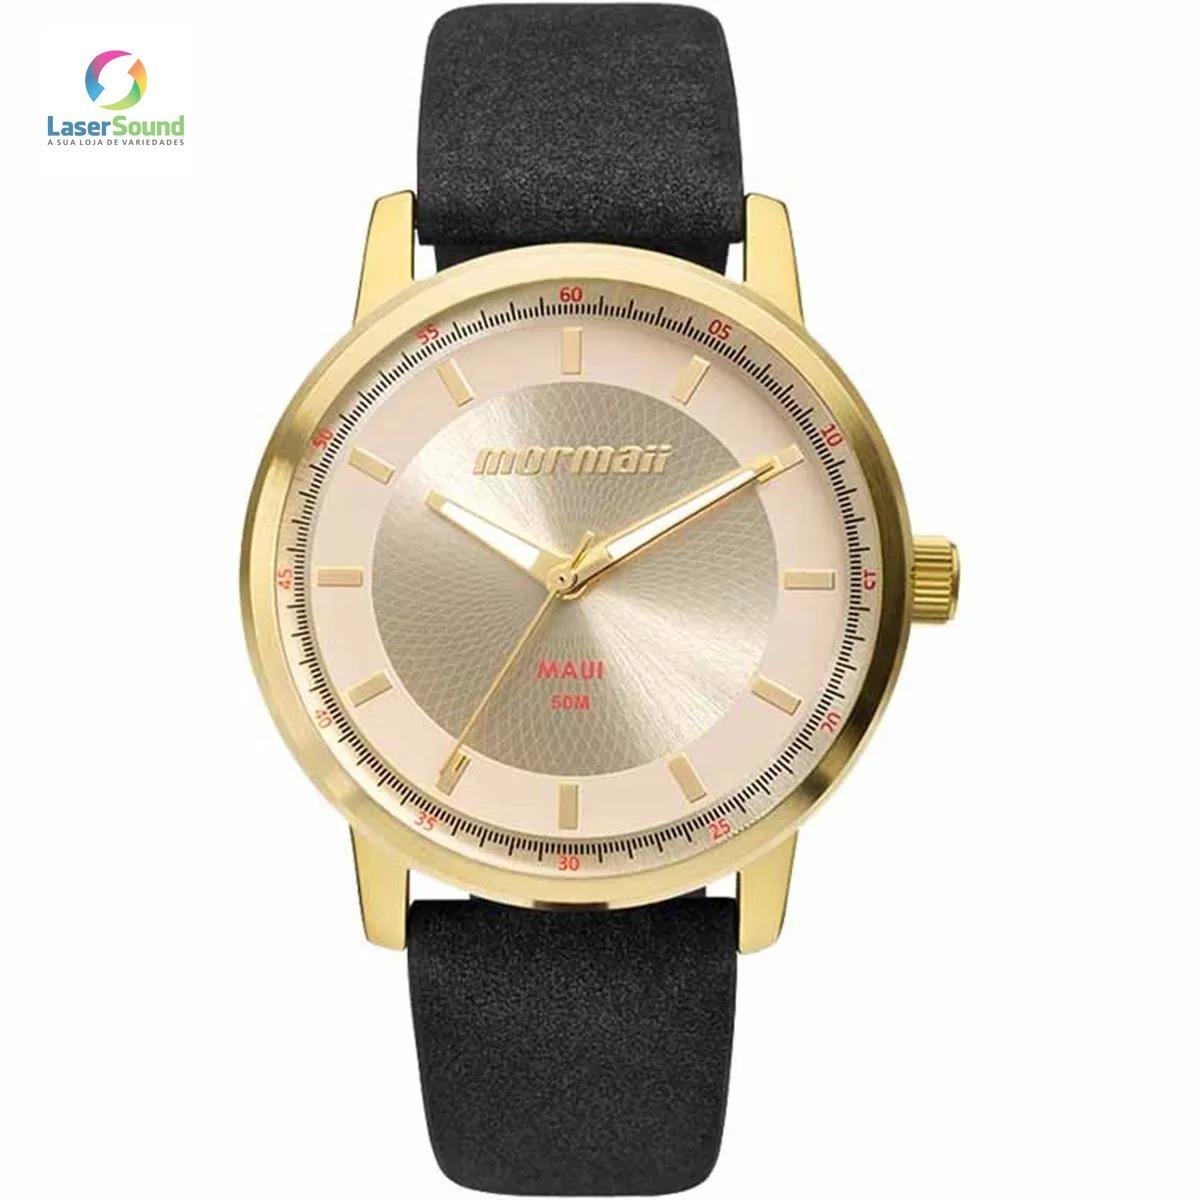 Relógio Mormaii Feminino Mo2035ib 2d, C  Garantia E Nf - R  179,00 ... 50b2b9806b